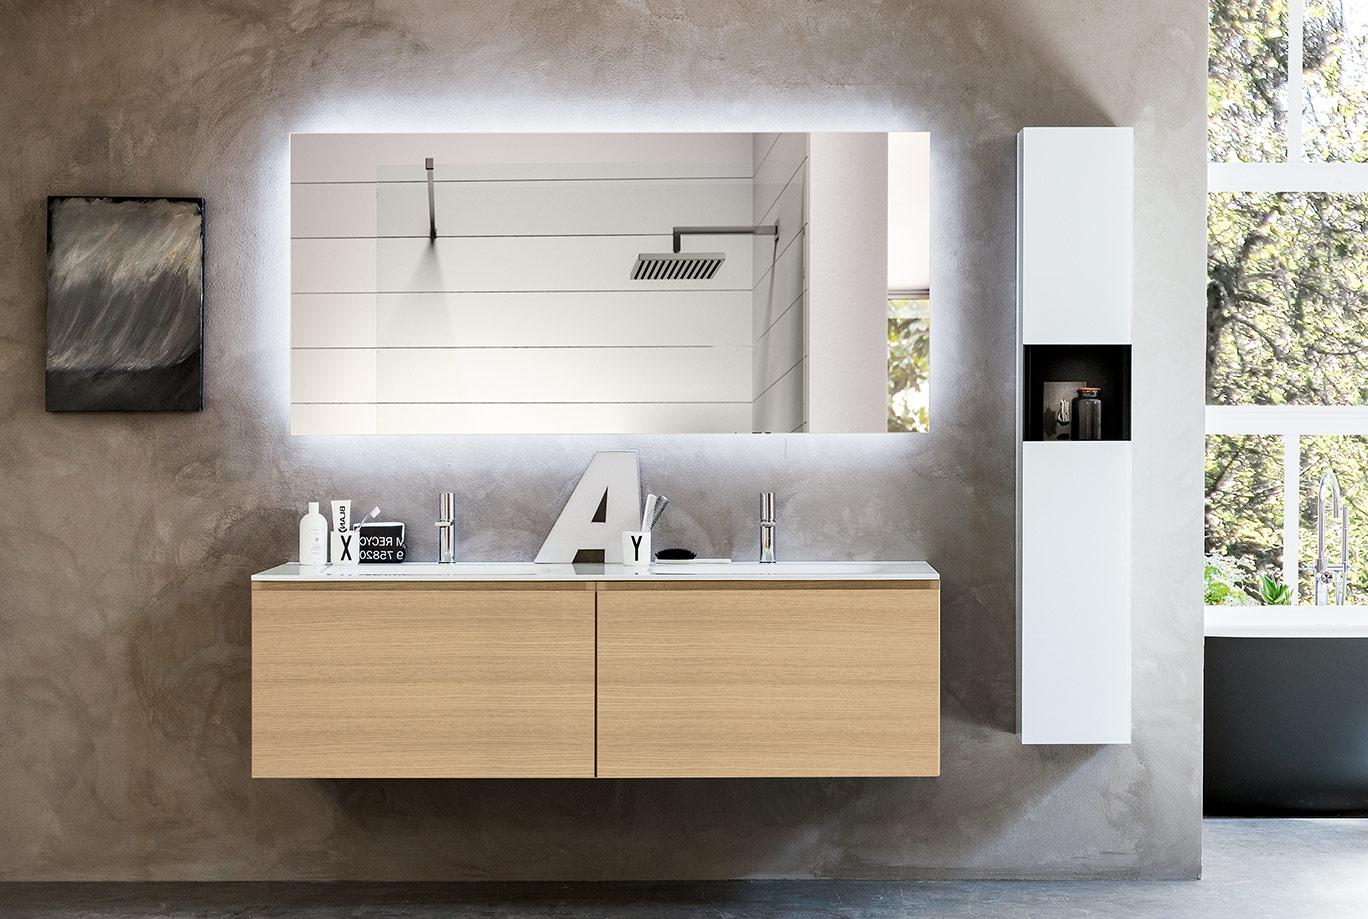 Domino legno info das badezimmer design badm 246 bel badezimmerm 246 bel badezimmer m 246 bel